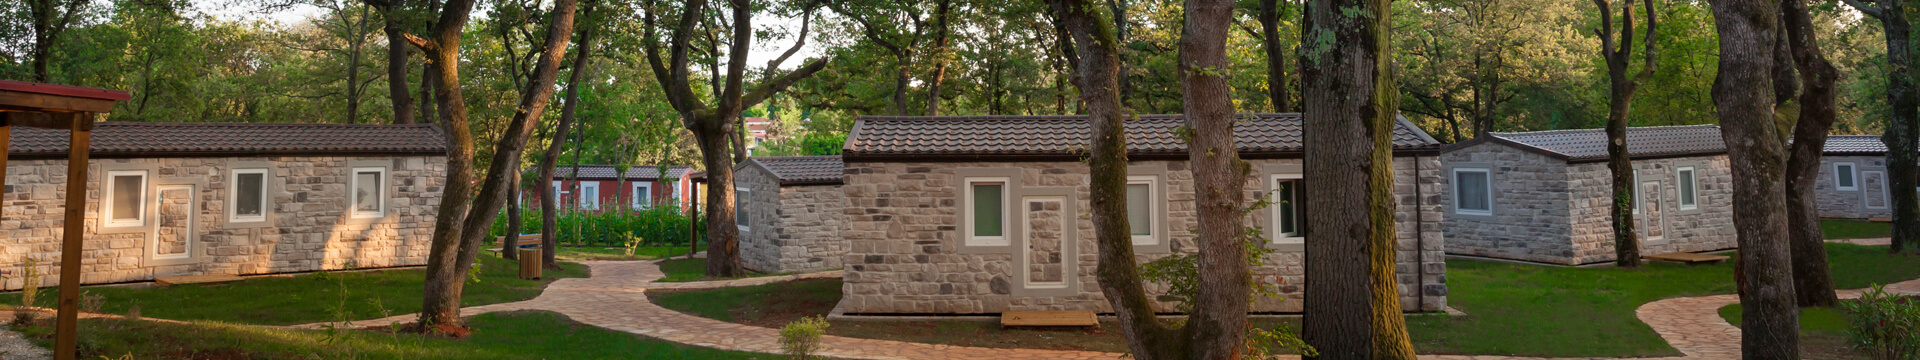 Pet friendly mobilne kućice | AdriaCamps